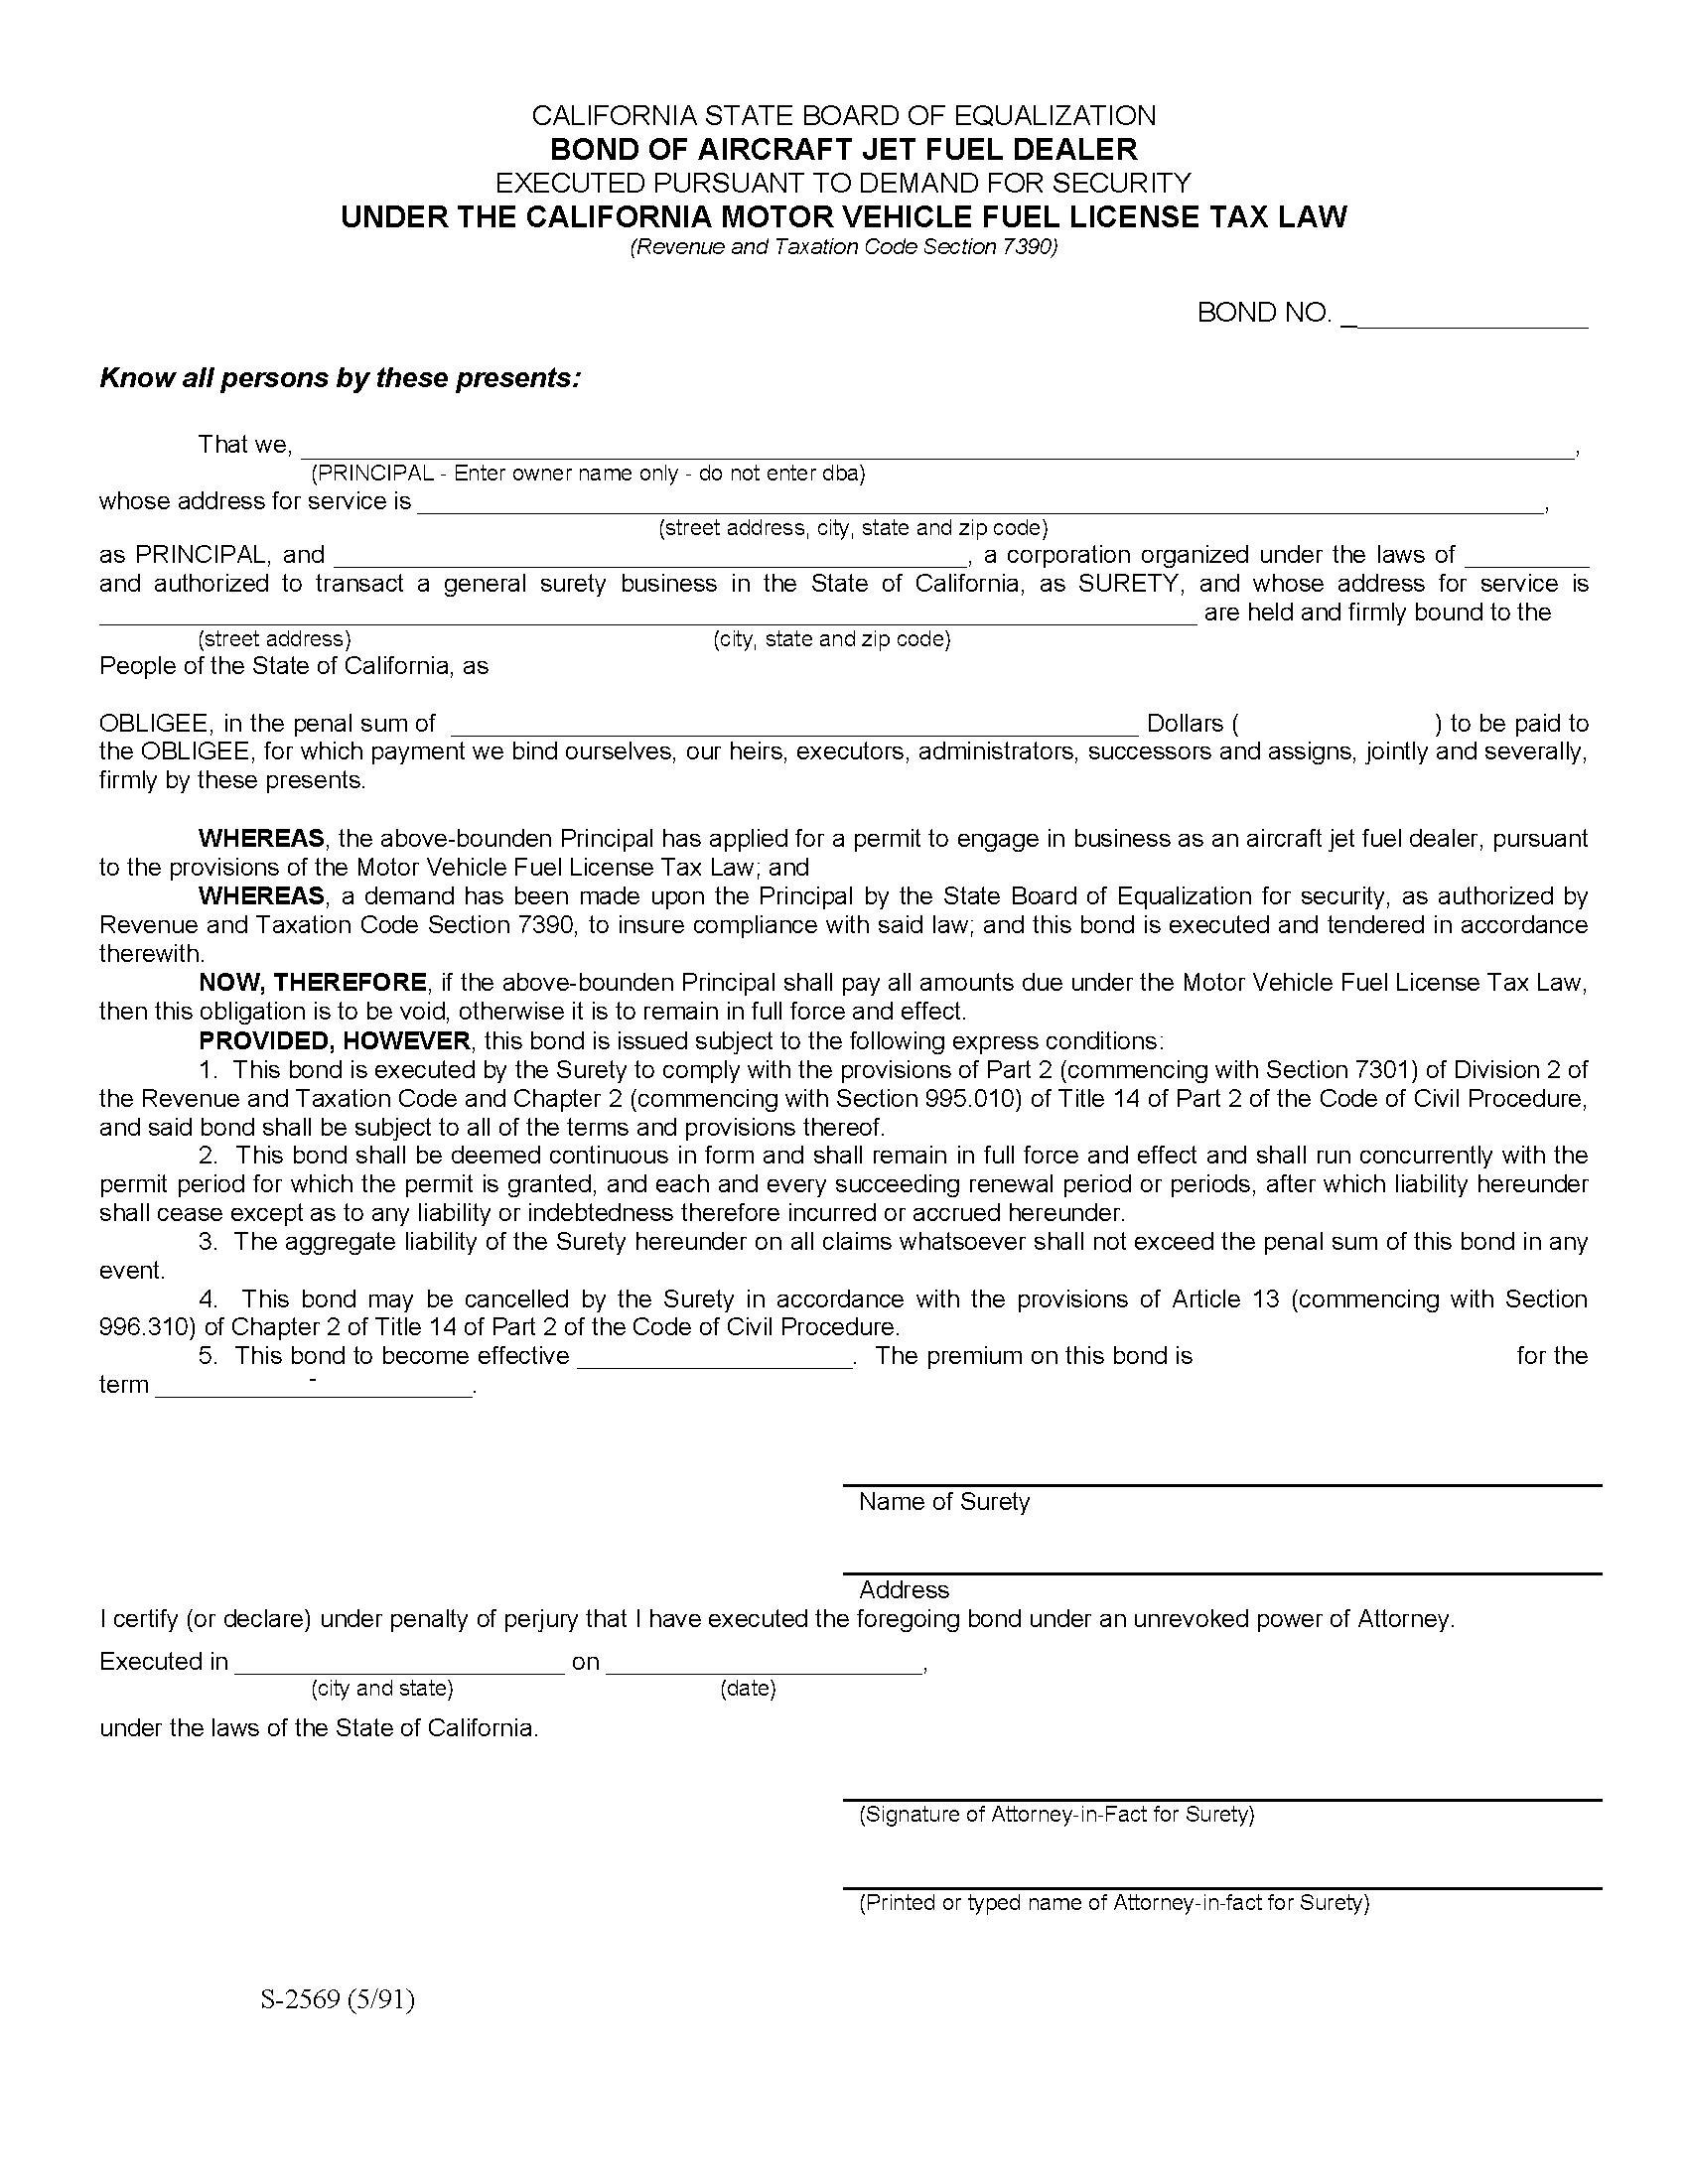 California State Board of Equalization Aircraft Jet Fuel Dealer sample image